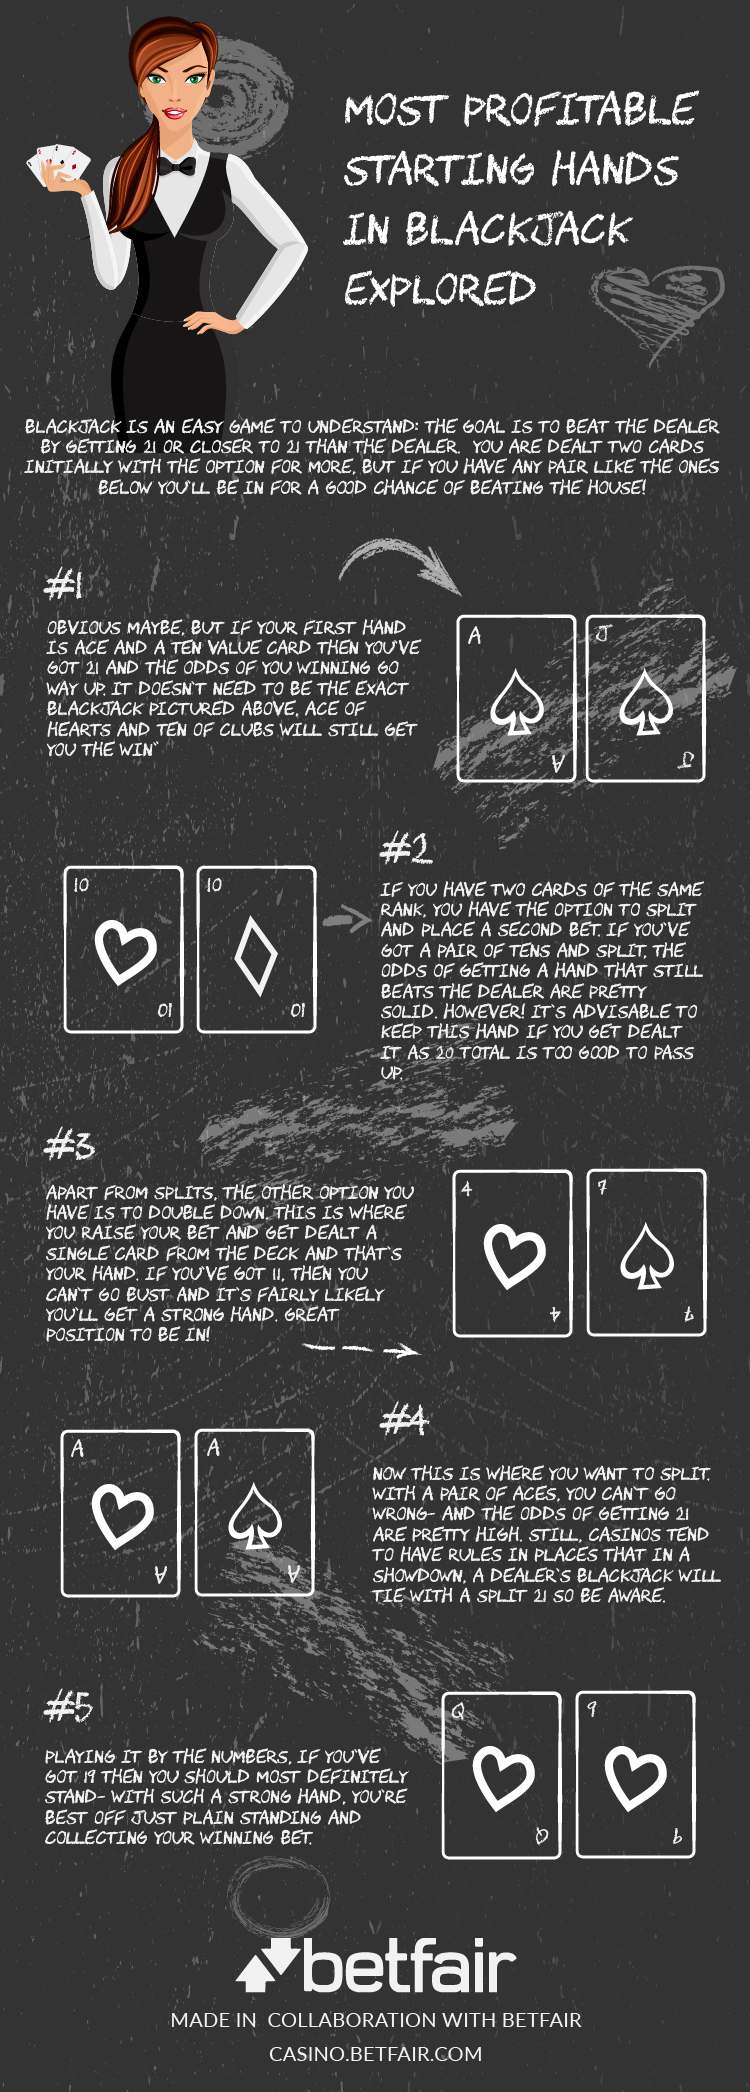 Blackjack Strategy Most - 242361